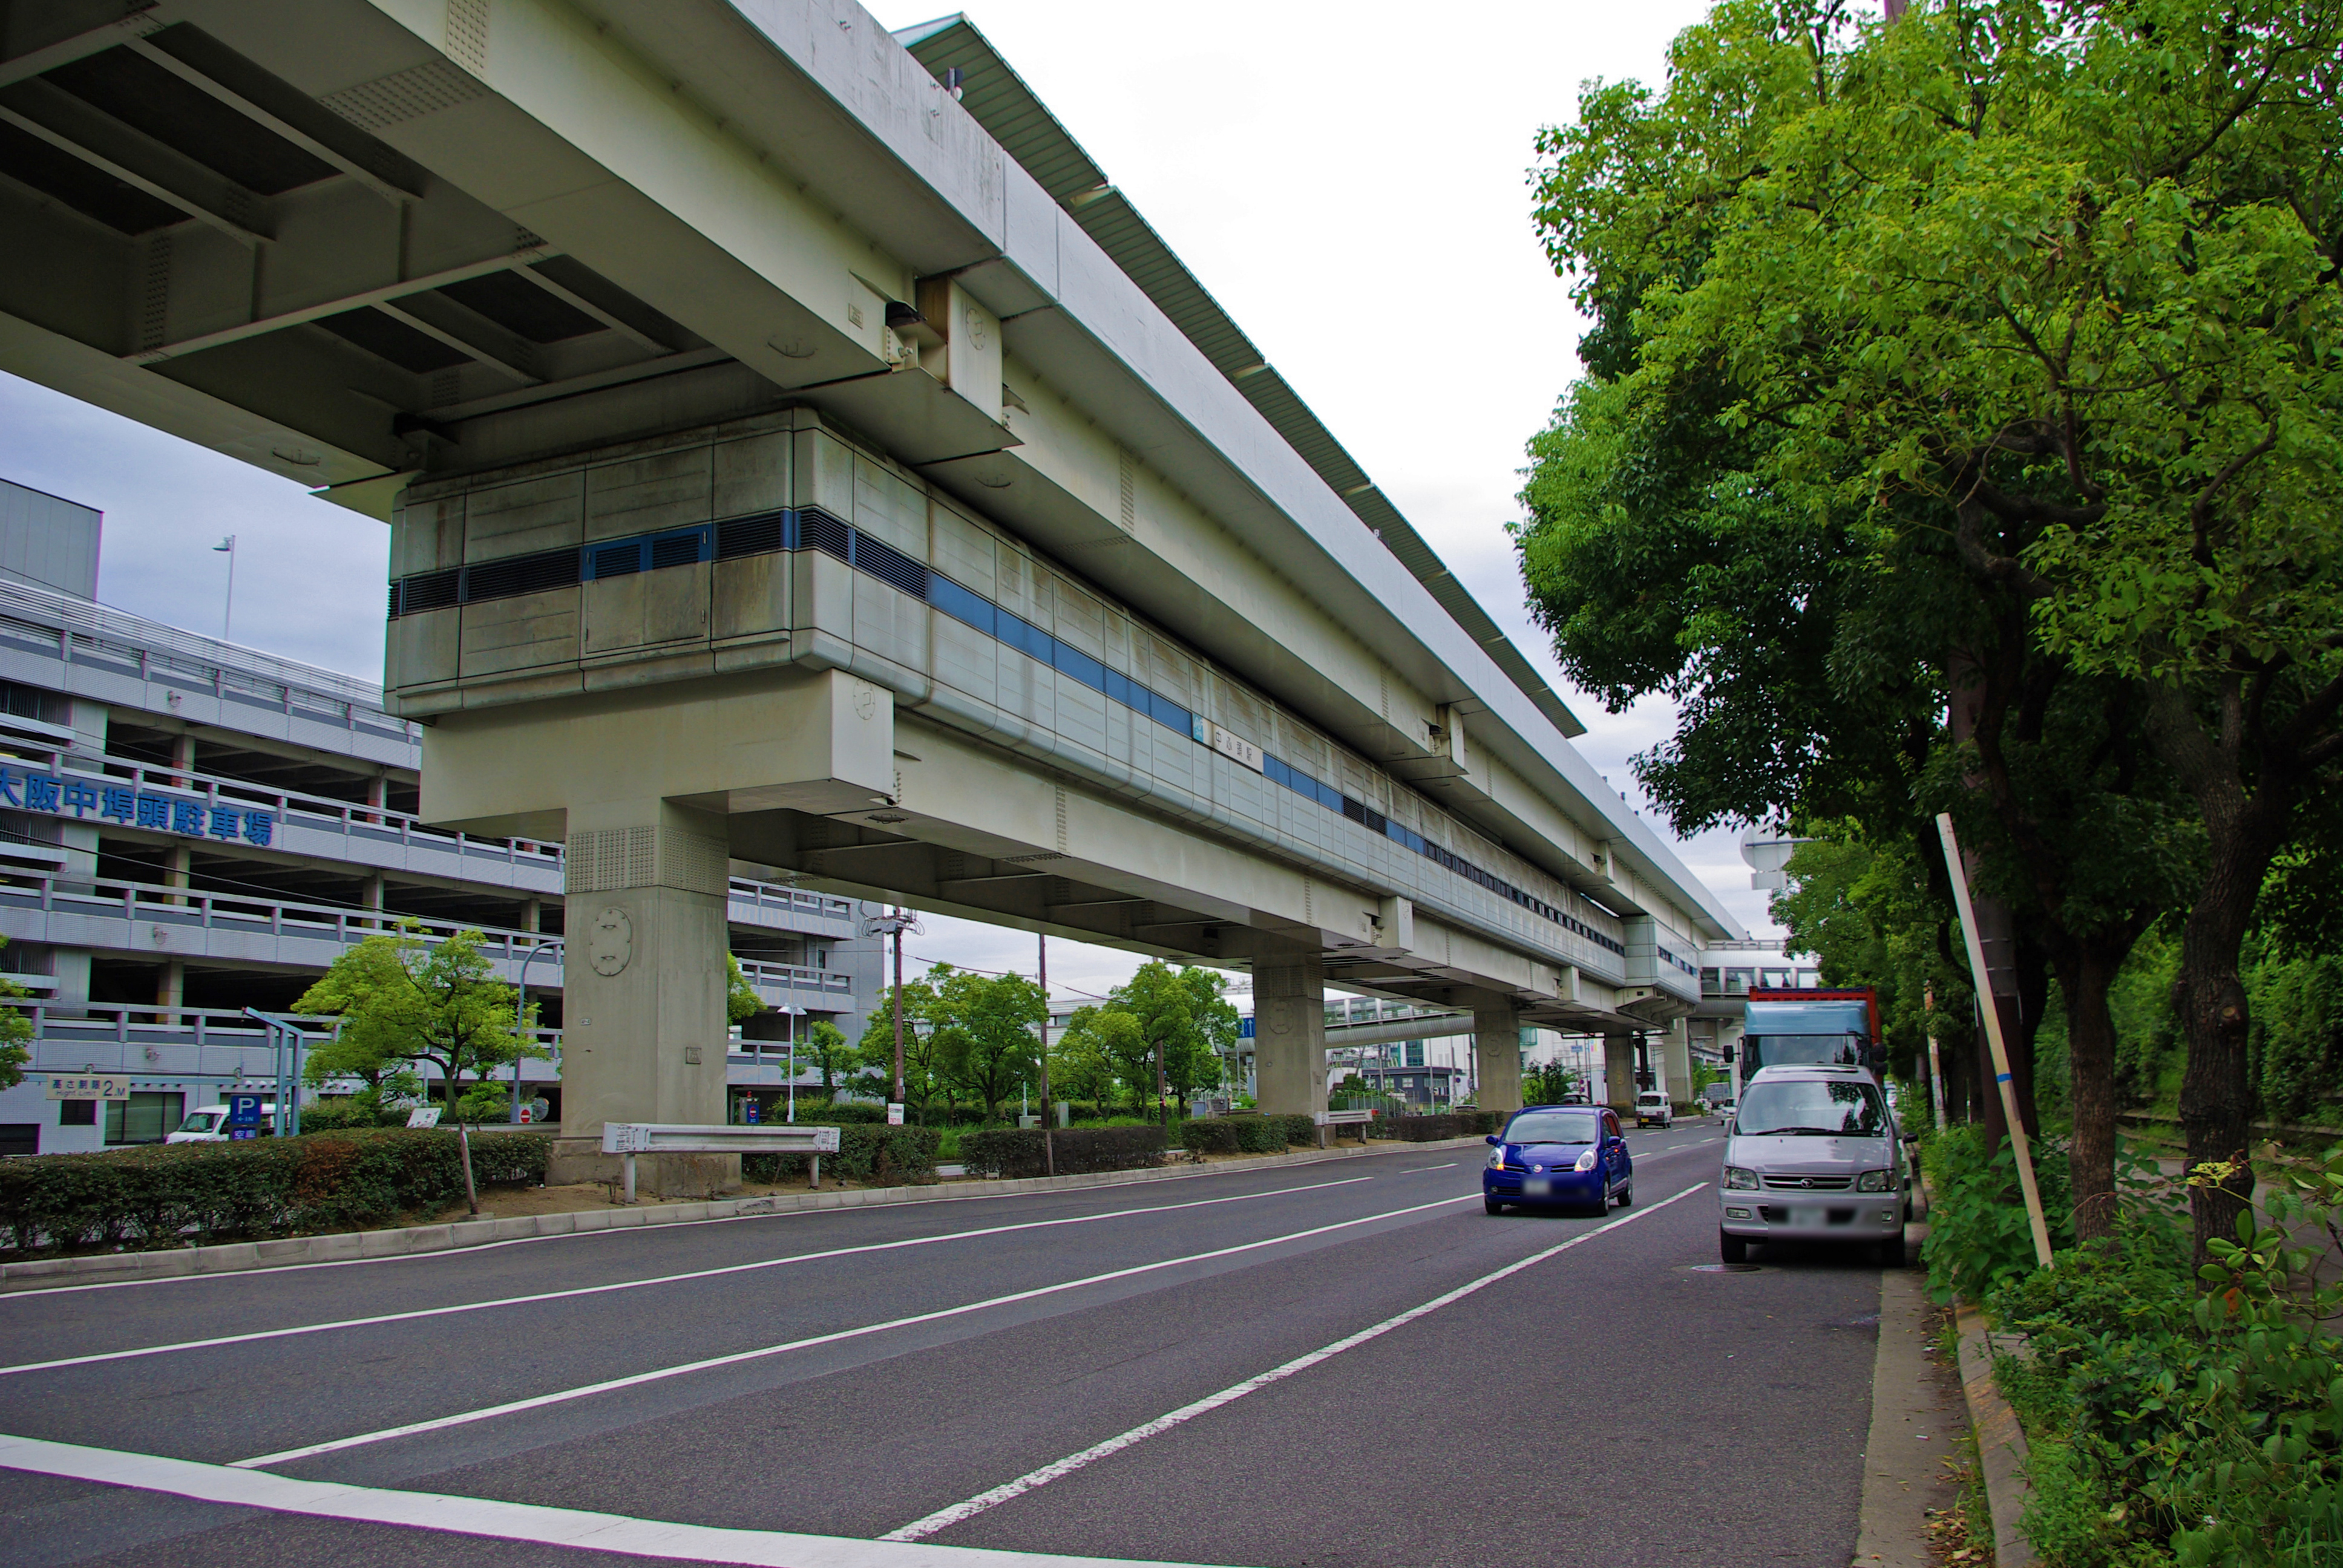 https://upload.wikimedia.org/wikipedia/commons/0/0d/Osaka_Nakafutou_sta_001.jpg